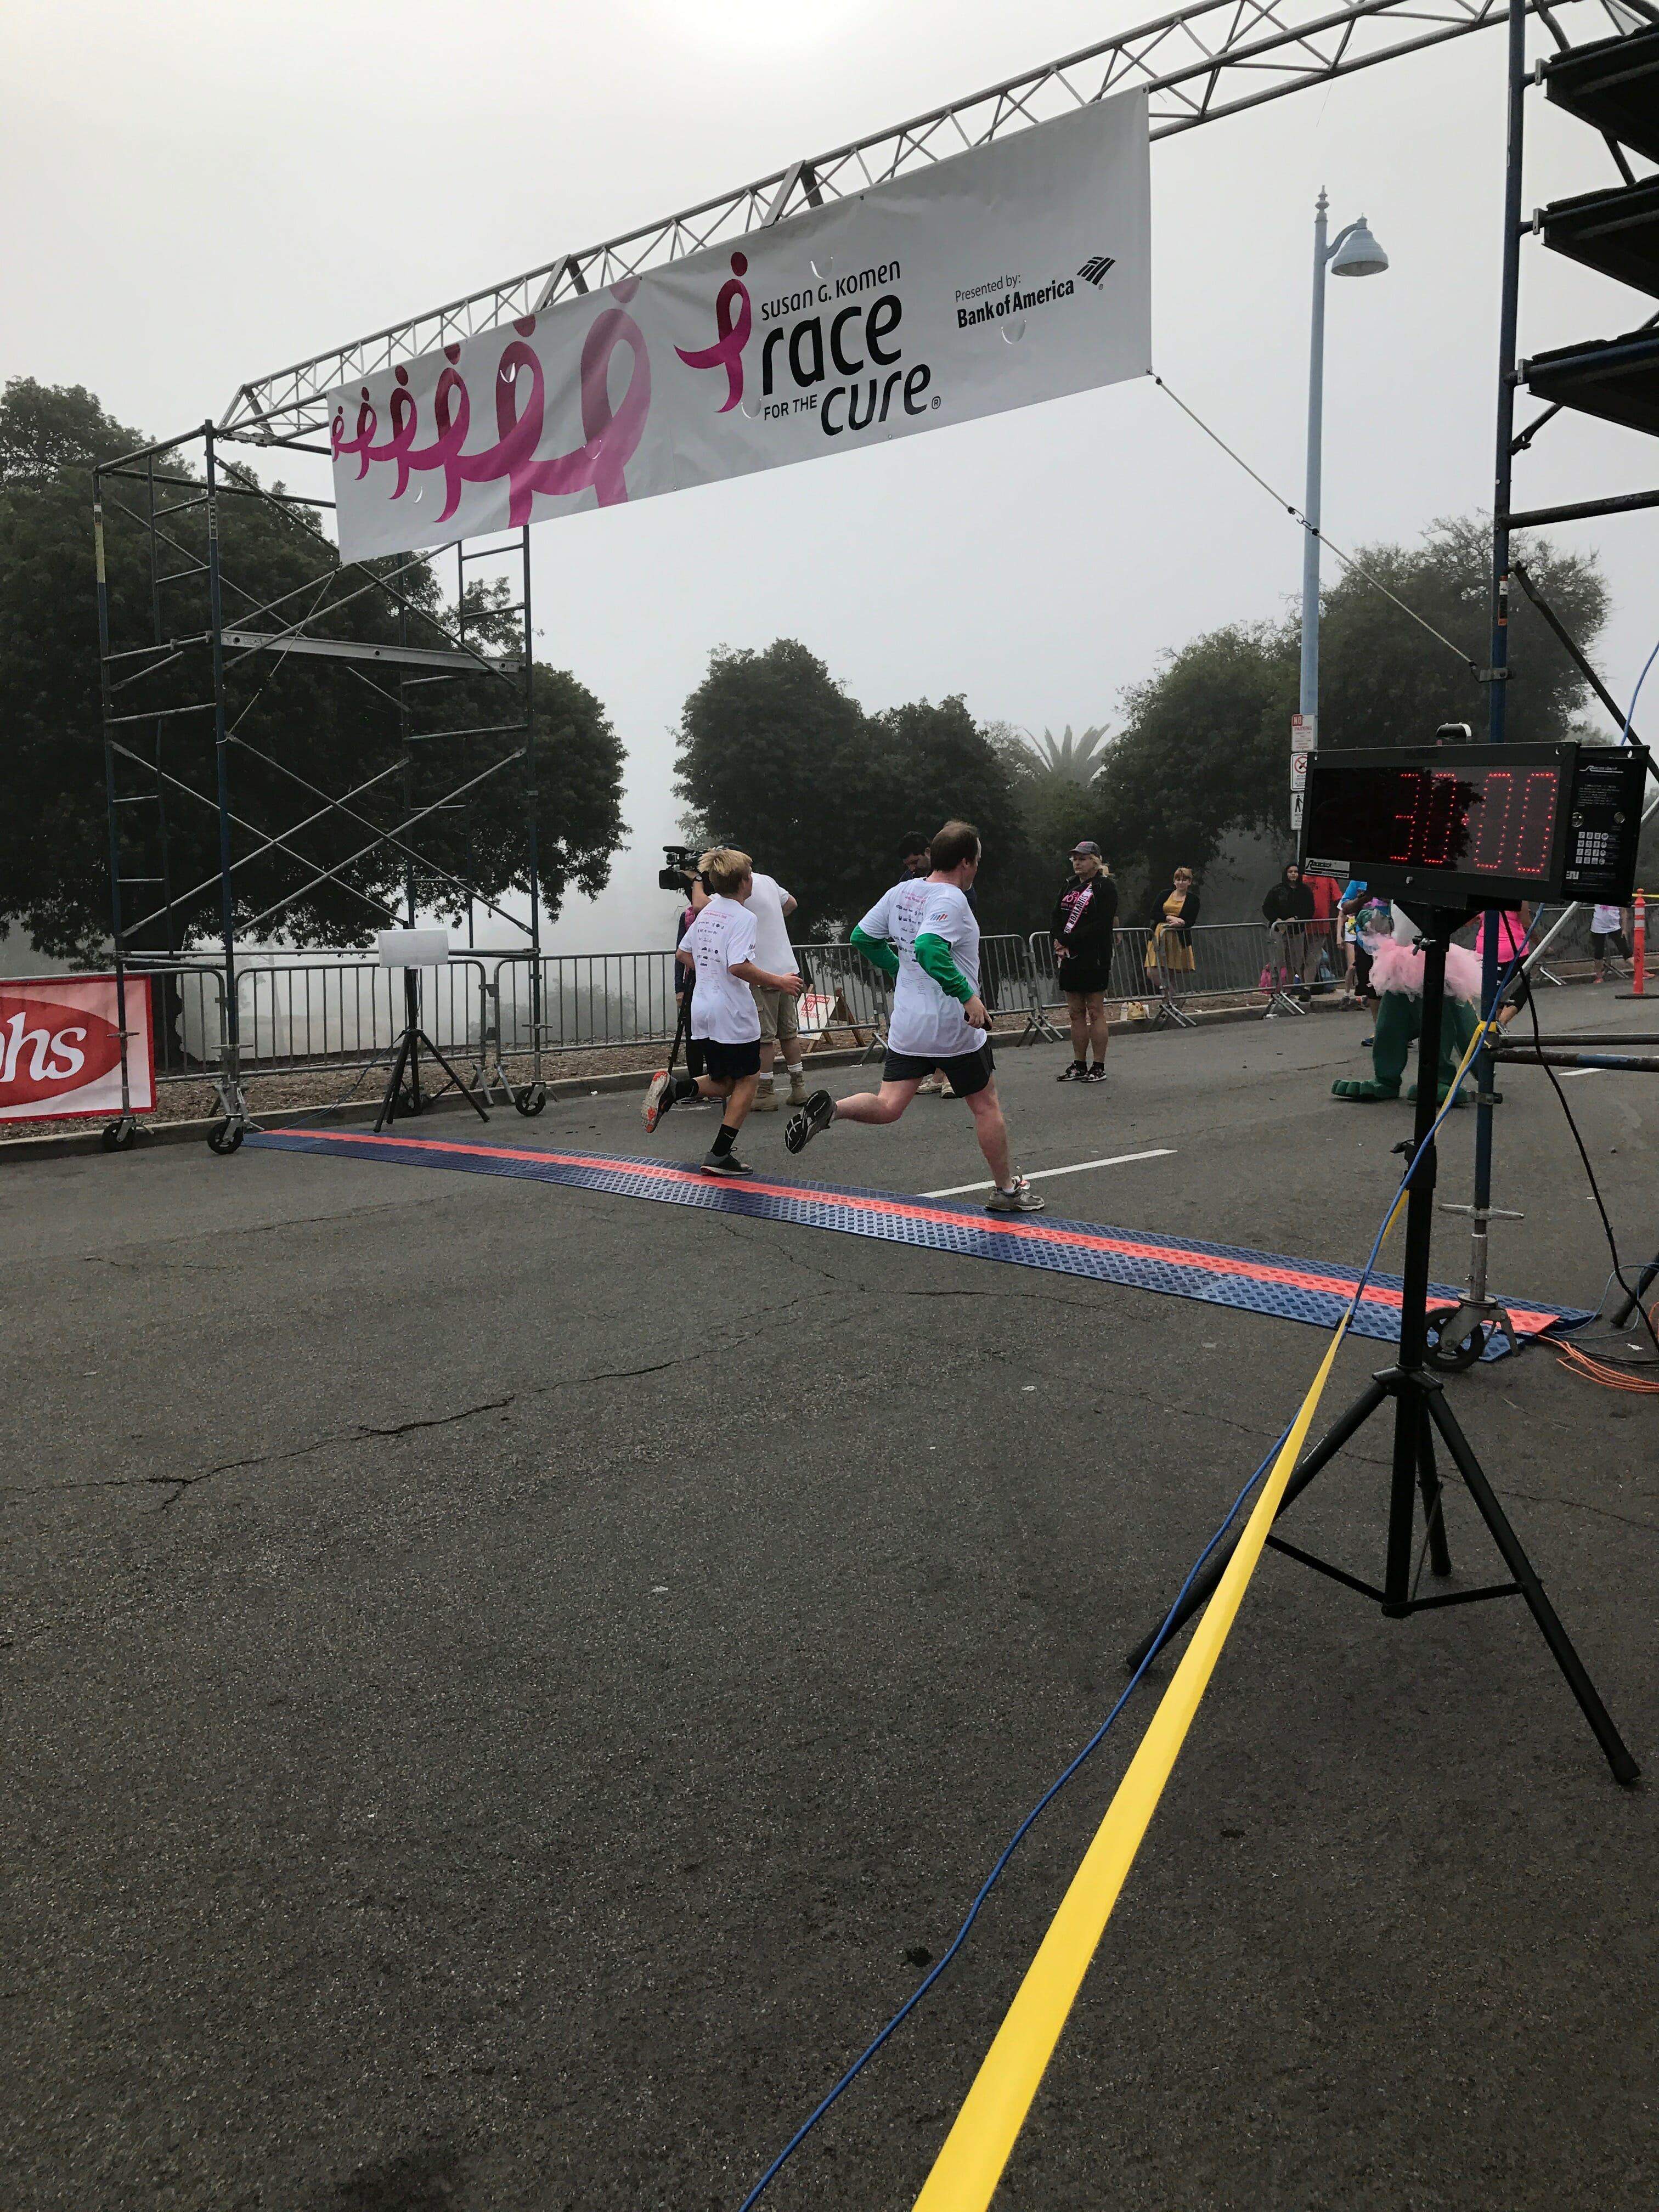 Patrick McKenna at the finish line.